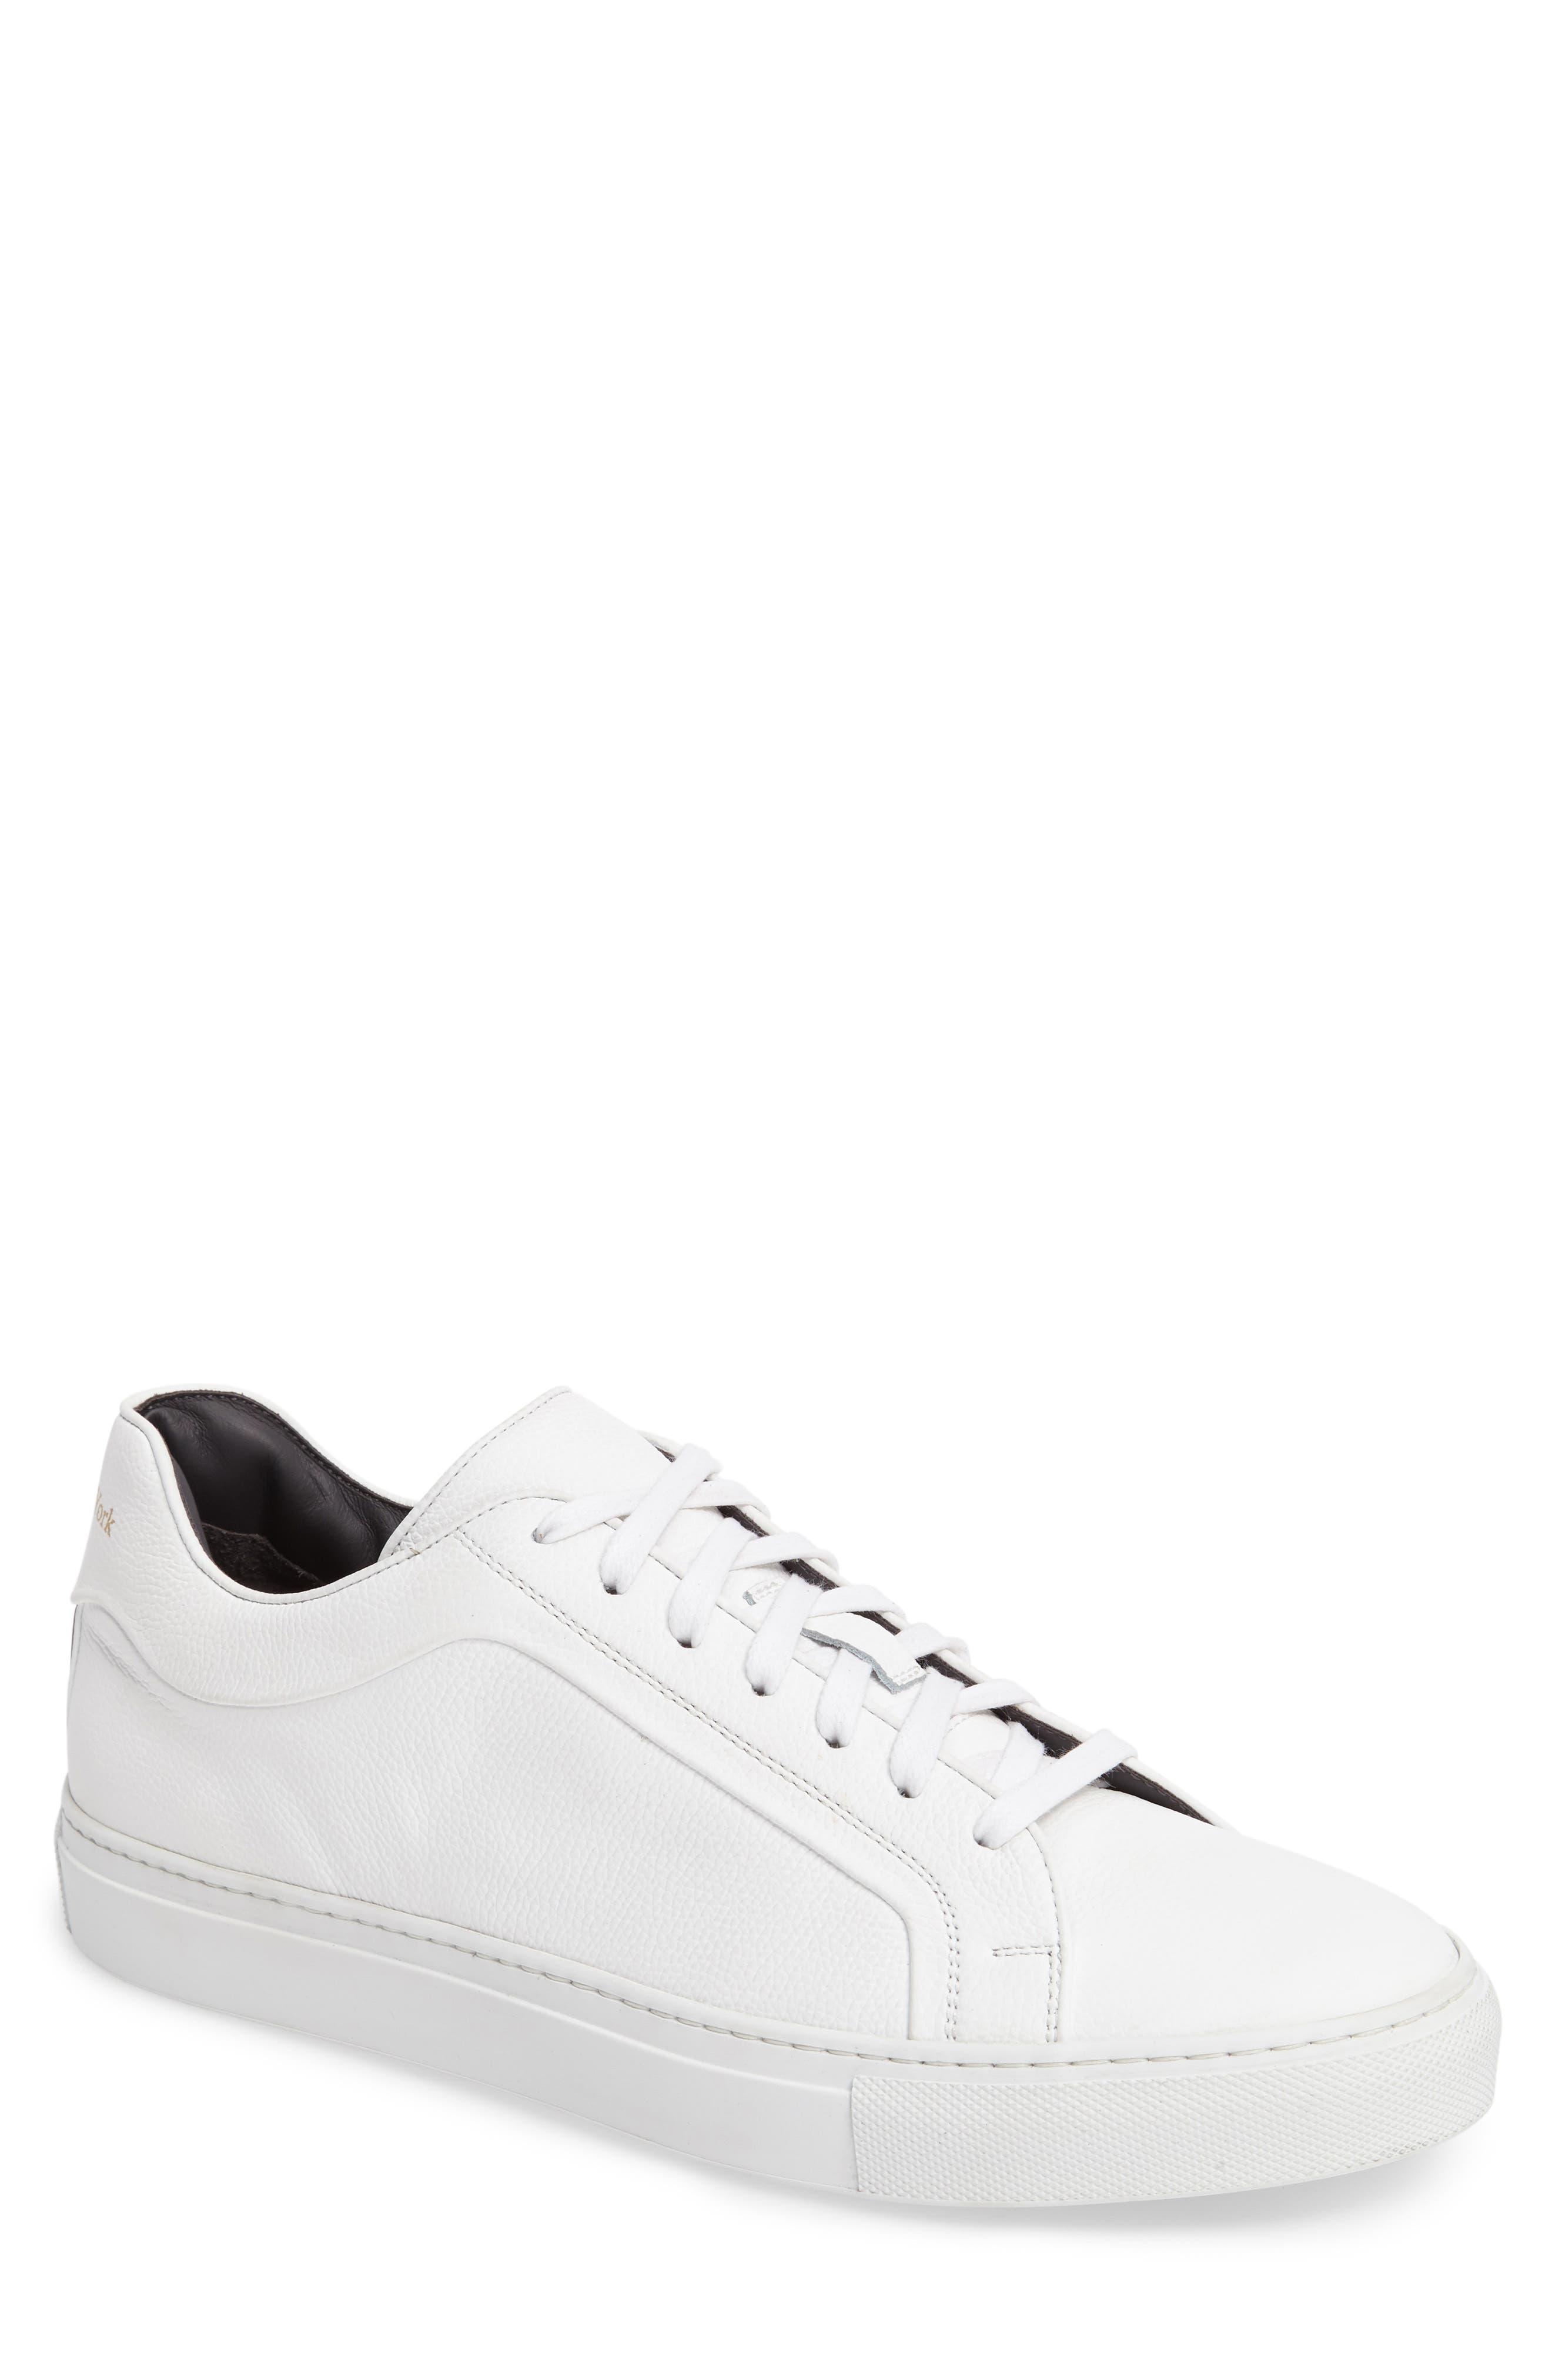 Alternate Image 1 Selected - To Boot New York Thomas Sneaker (Men)